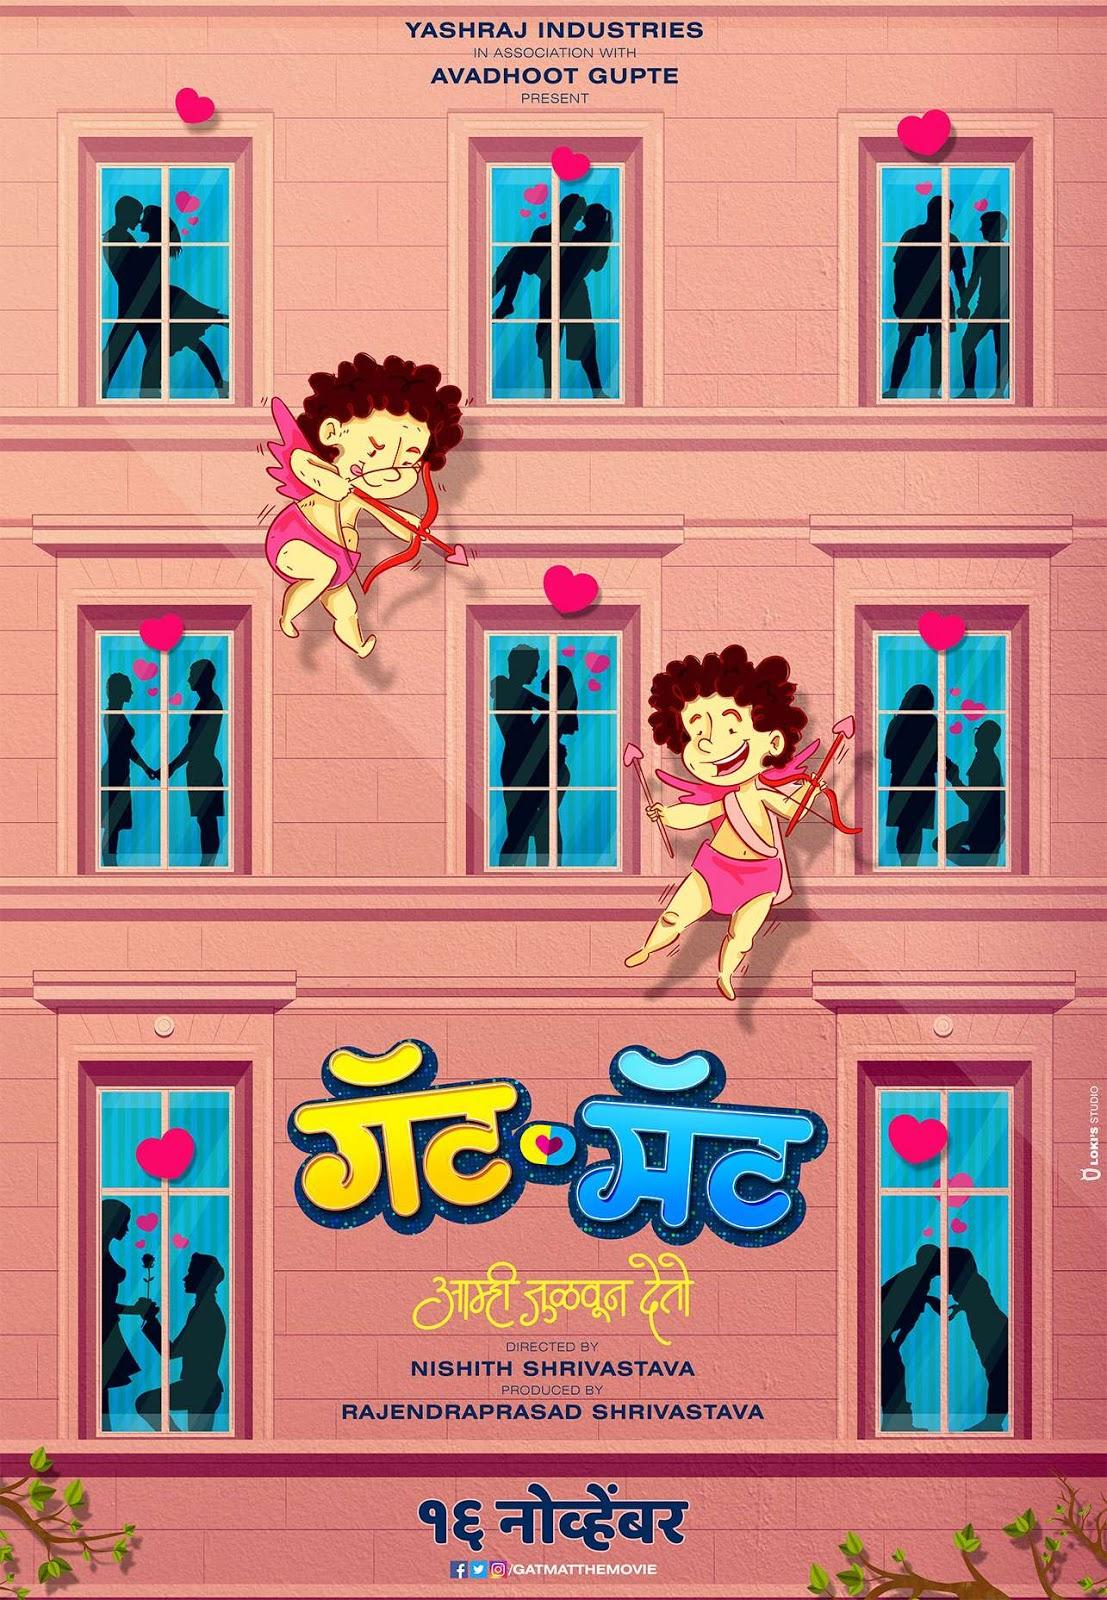 गॅटमॅट मराठी चित्रपटाचे टीझर पोस्टर - मराठी चित्रपट | Gat Mat Marathi Movie Teaser Poster - Marathi Movie